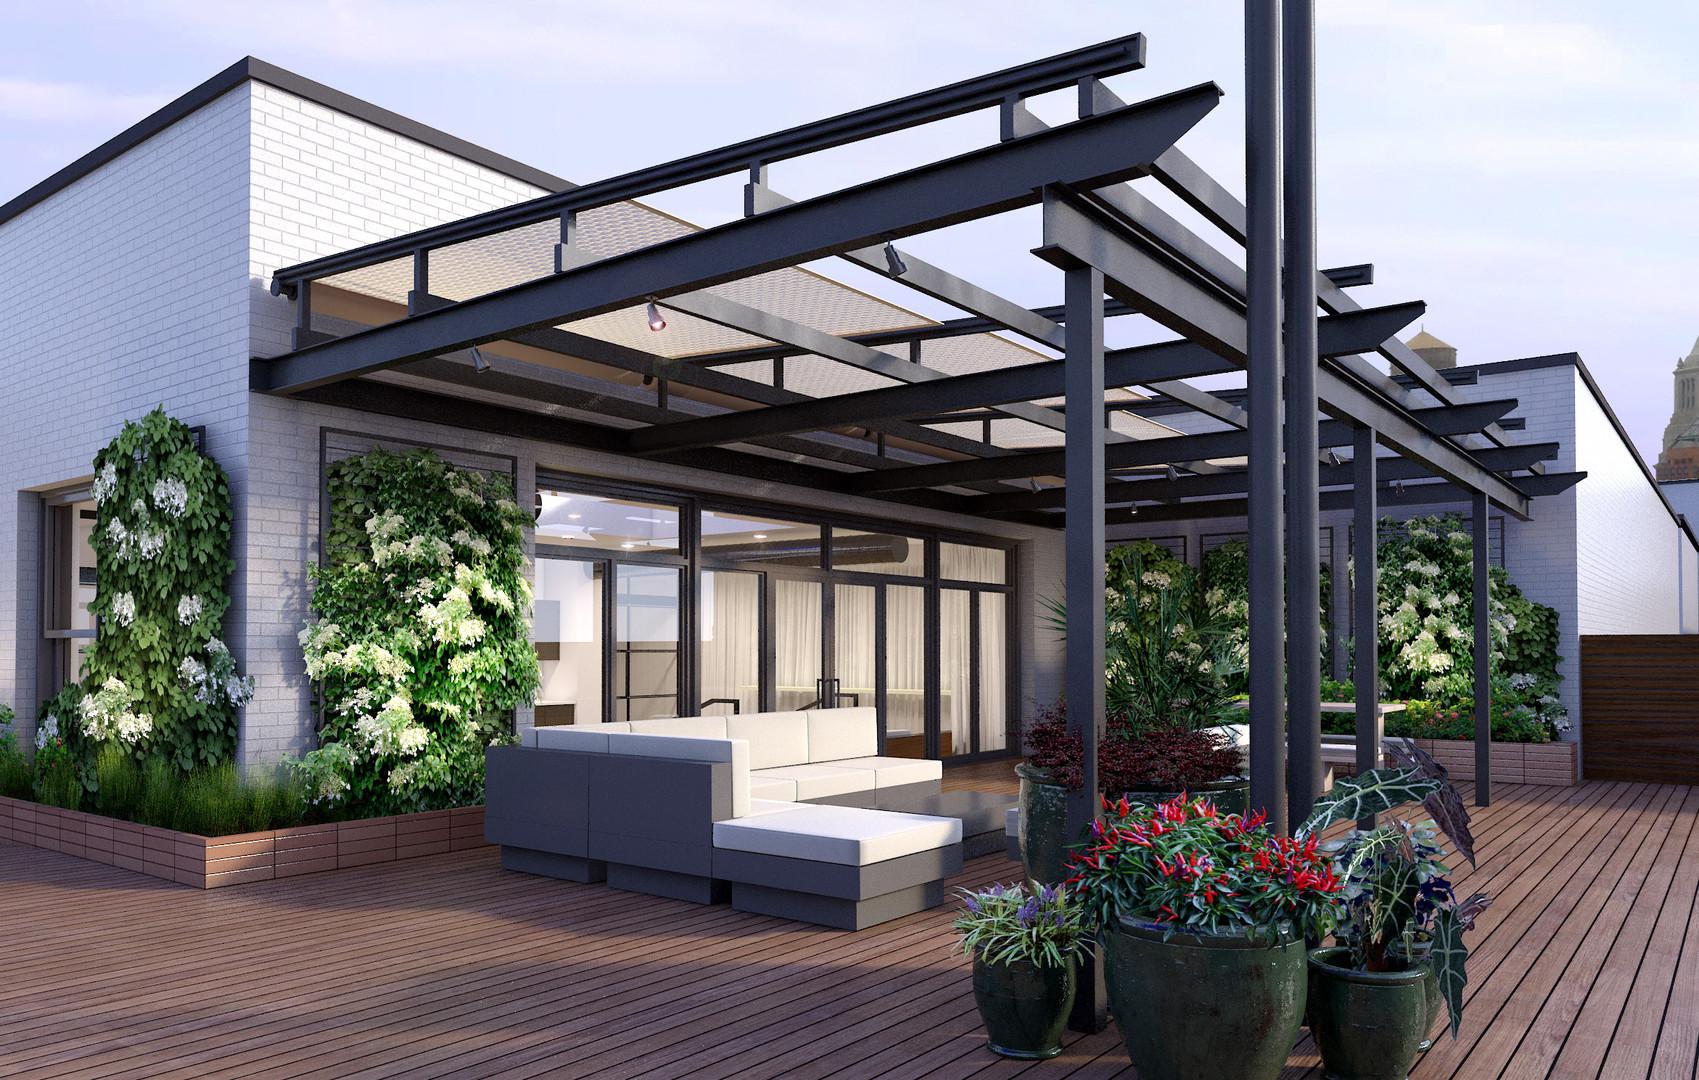 A penthouse_HDRI_03.jpg